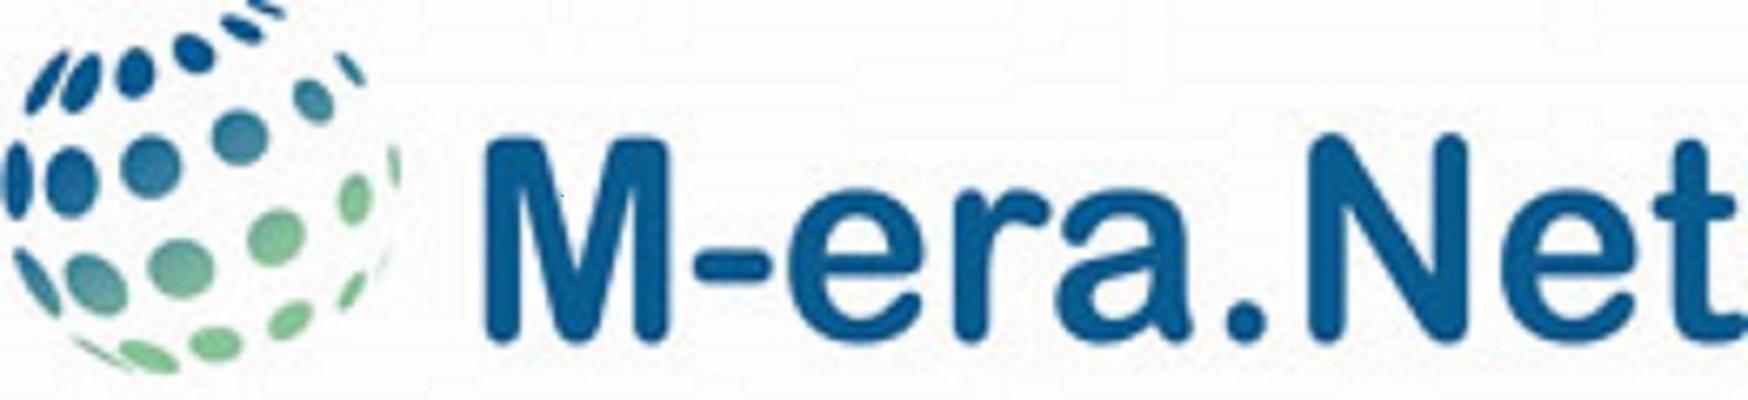 M-era.Net Logo